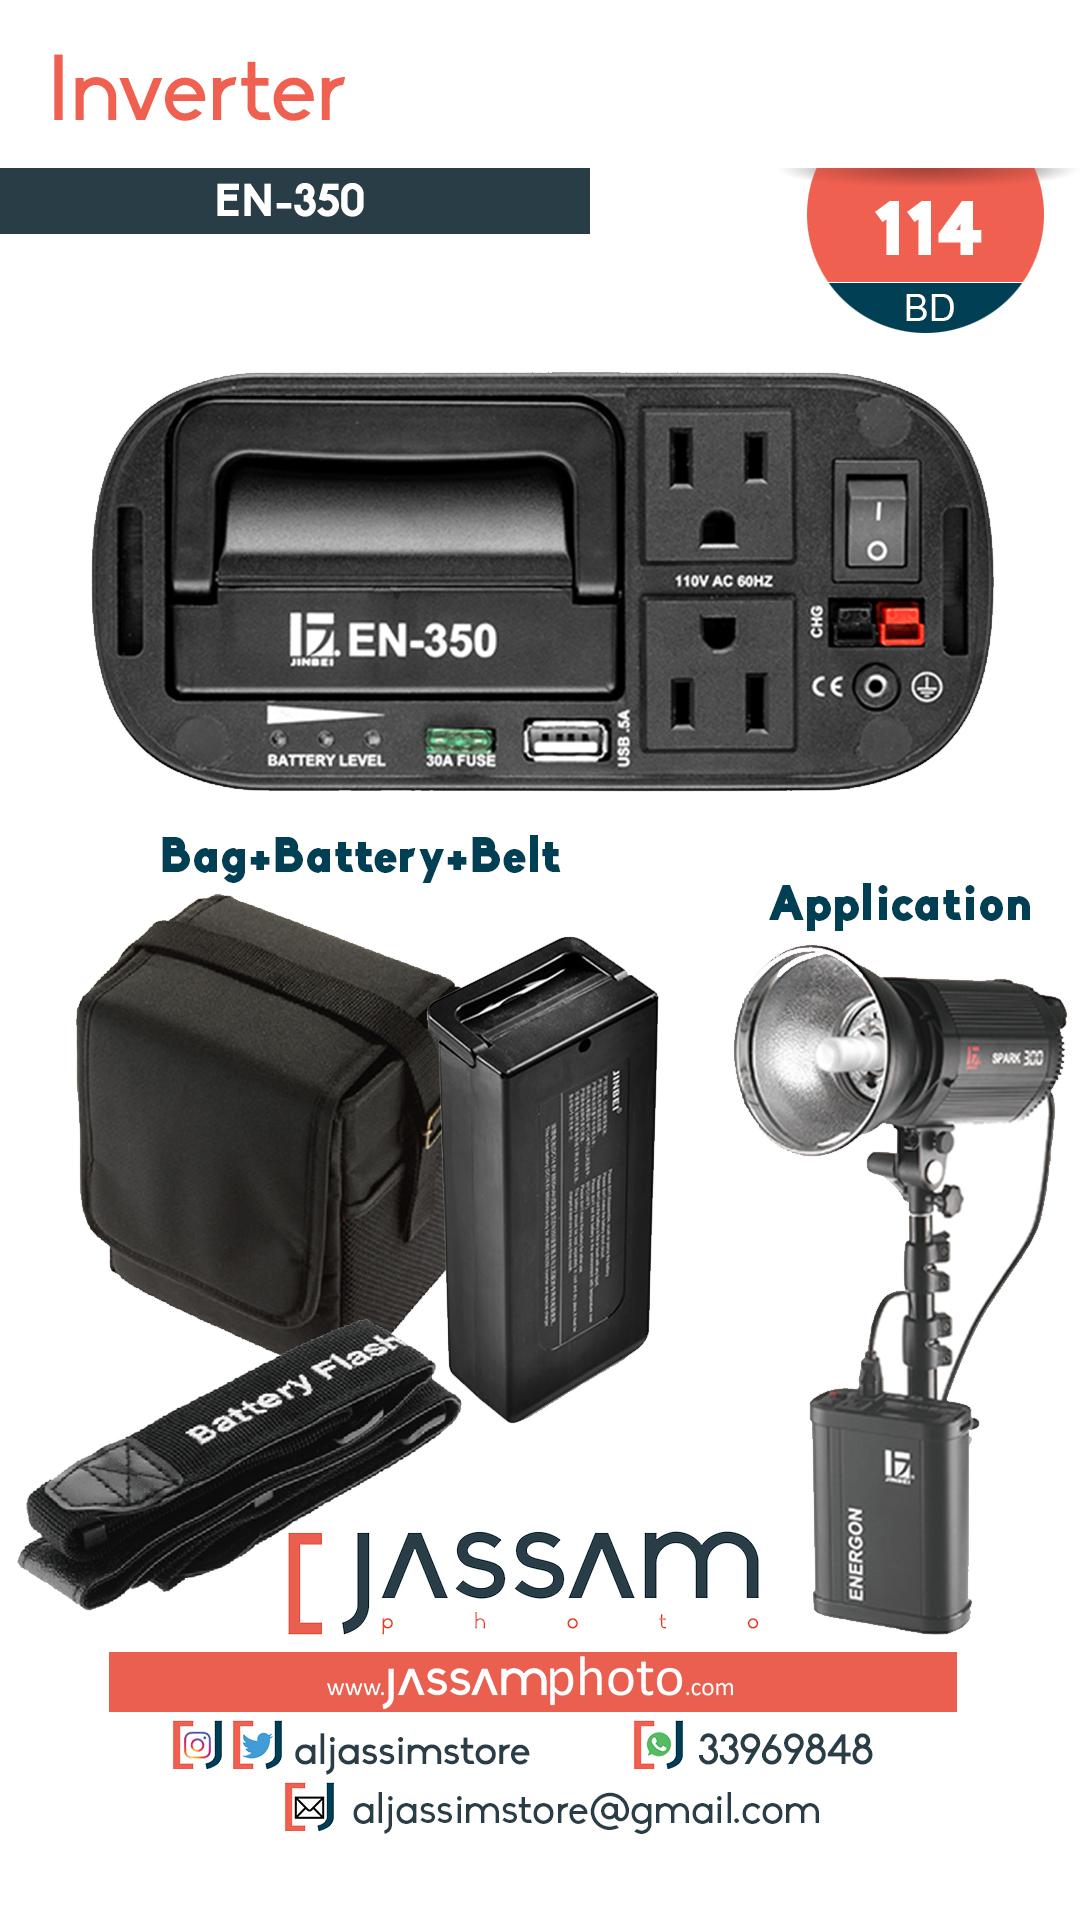 Inverter EN-350